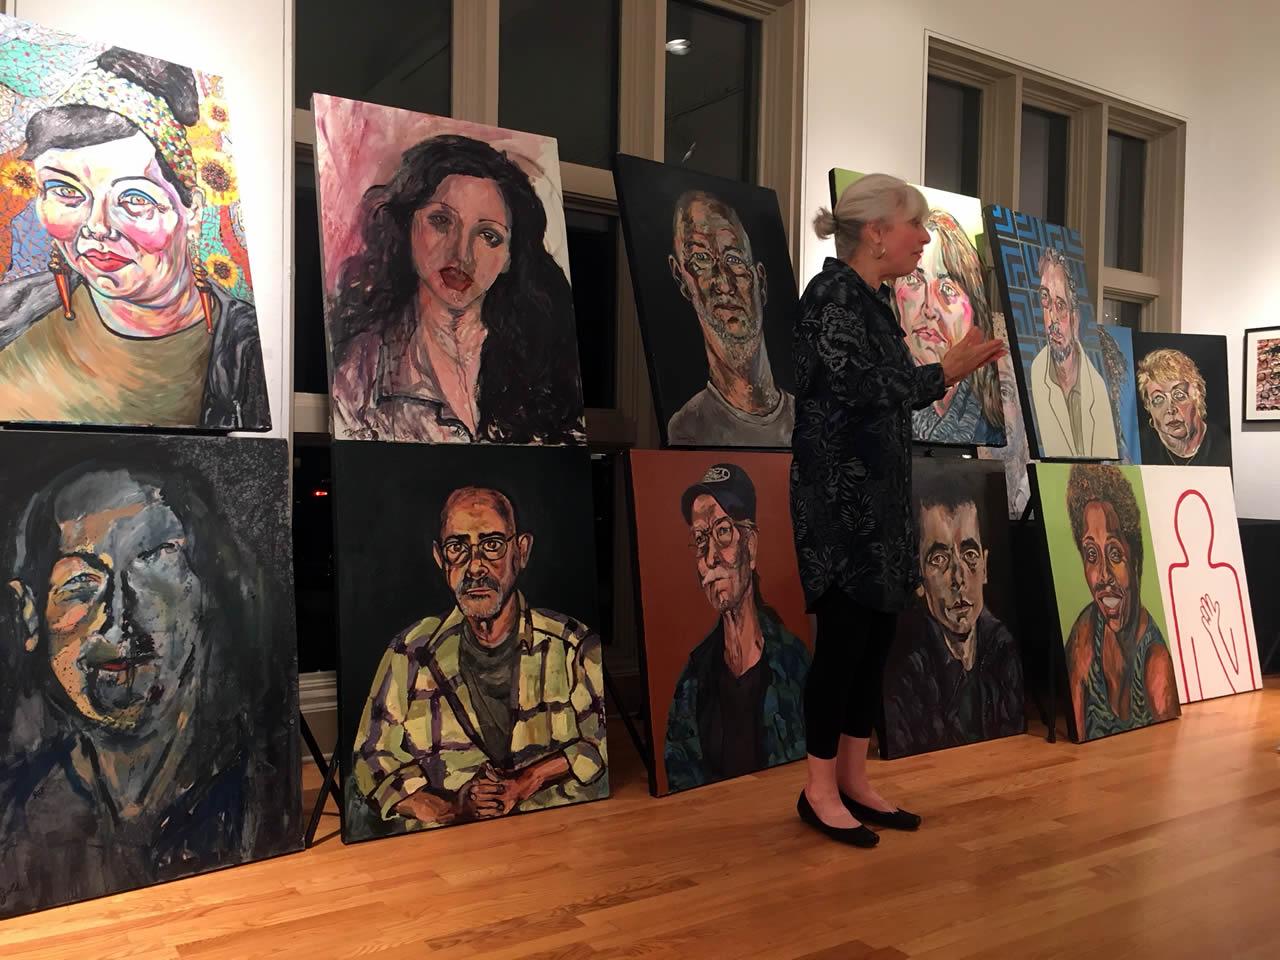 BrownGold's portrait series explores healthcare in America.